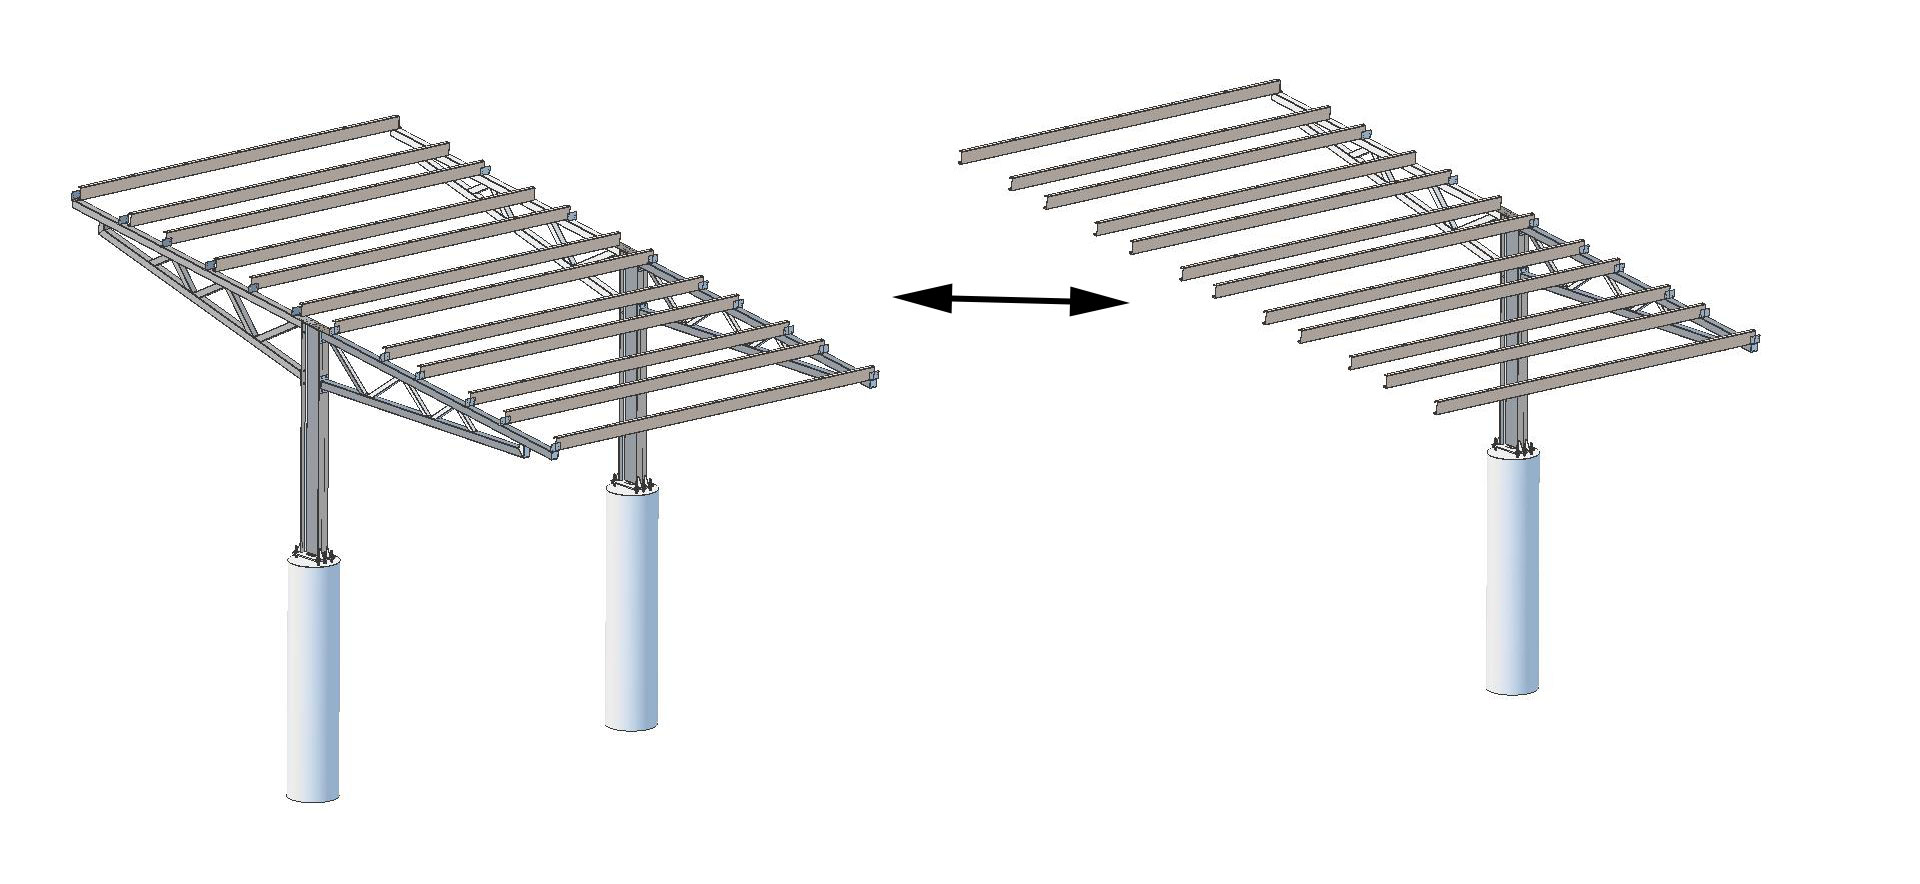 T-Frame solar carport sections image.